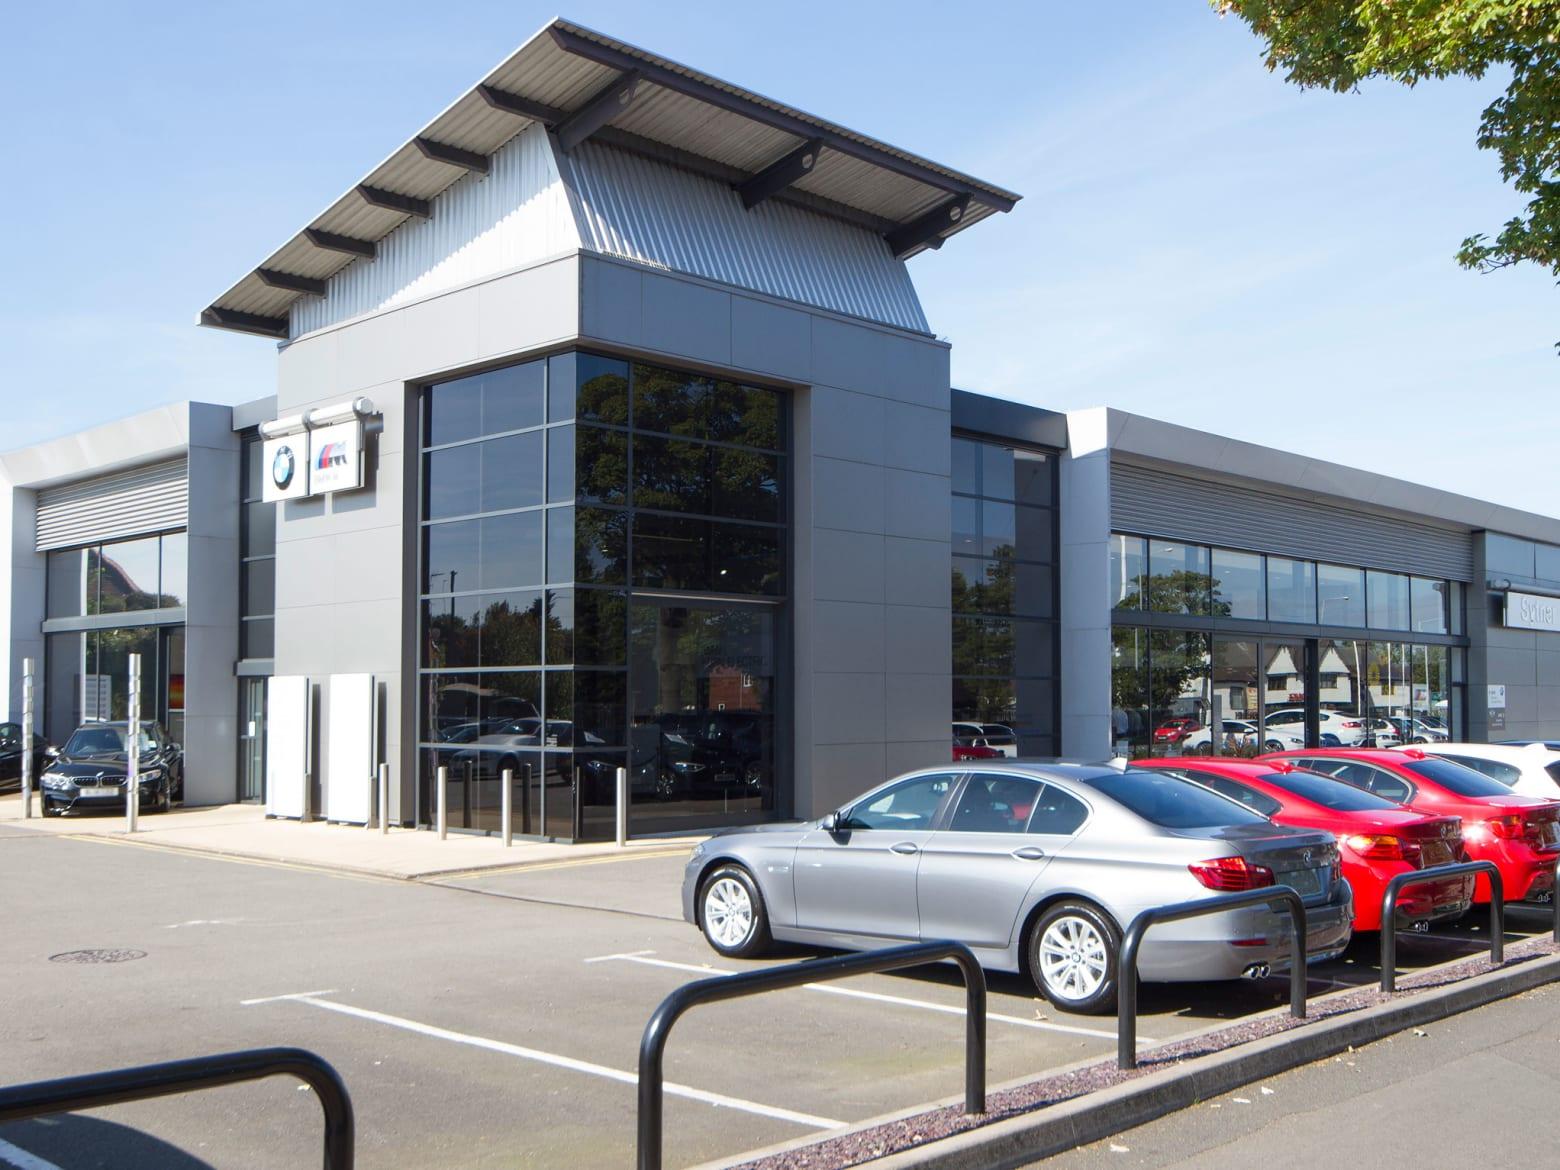 Sytner Oldbury Sytner Group Limited